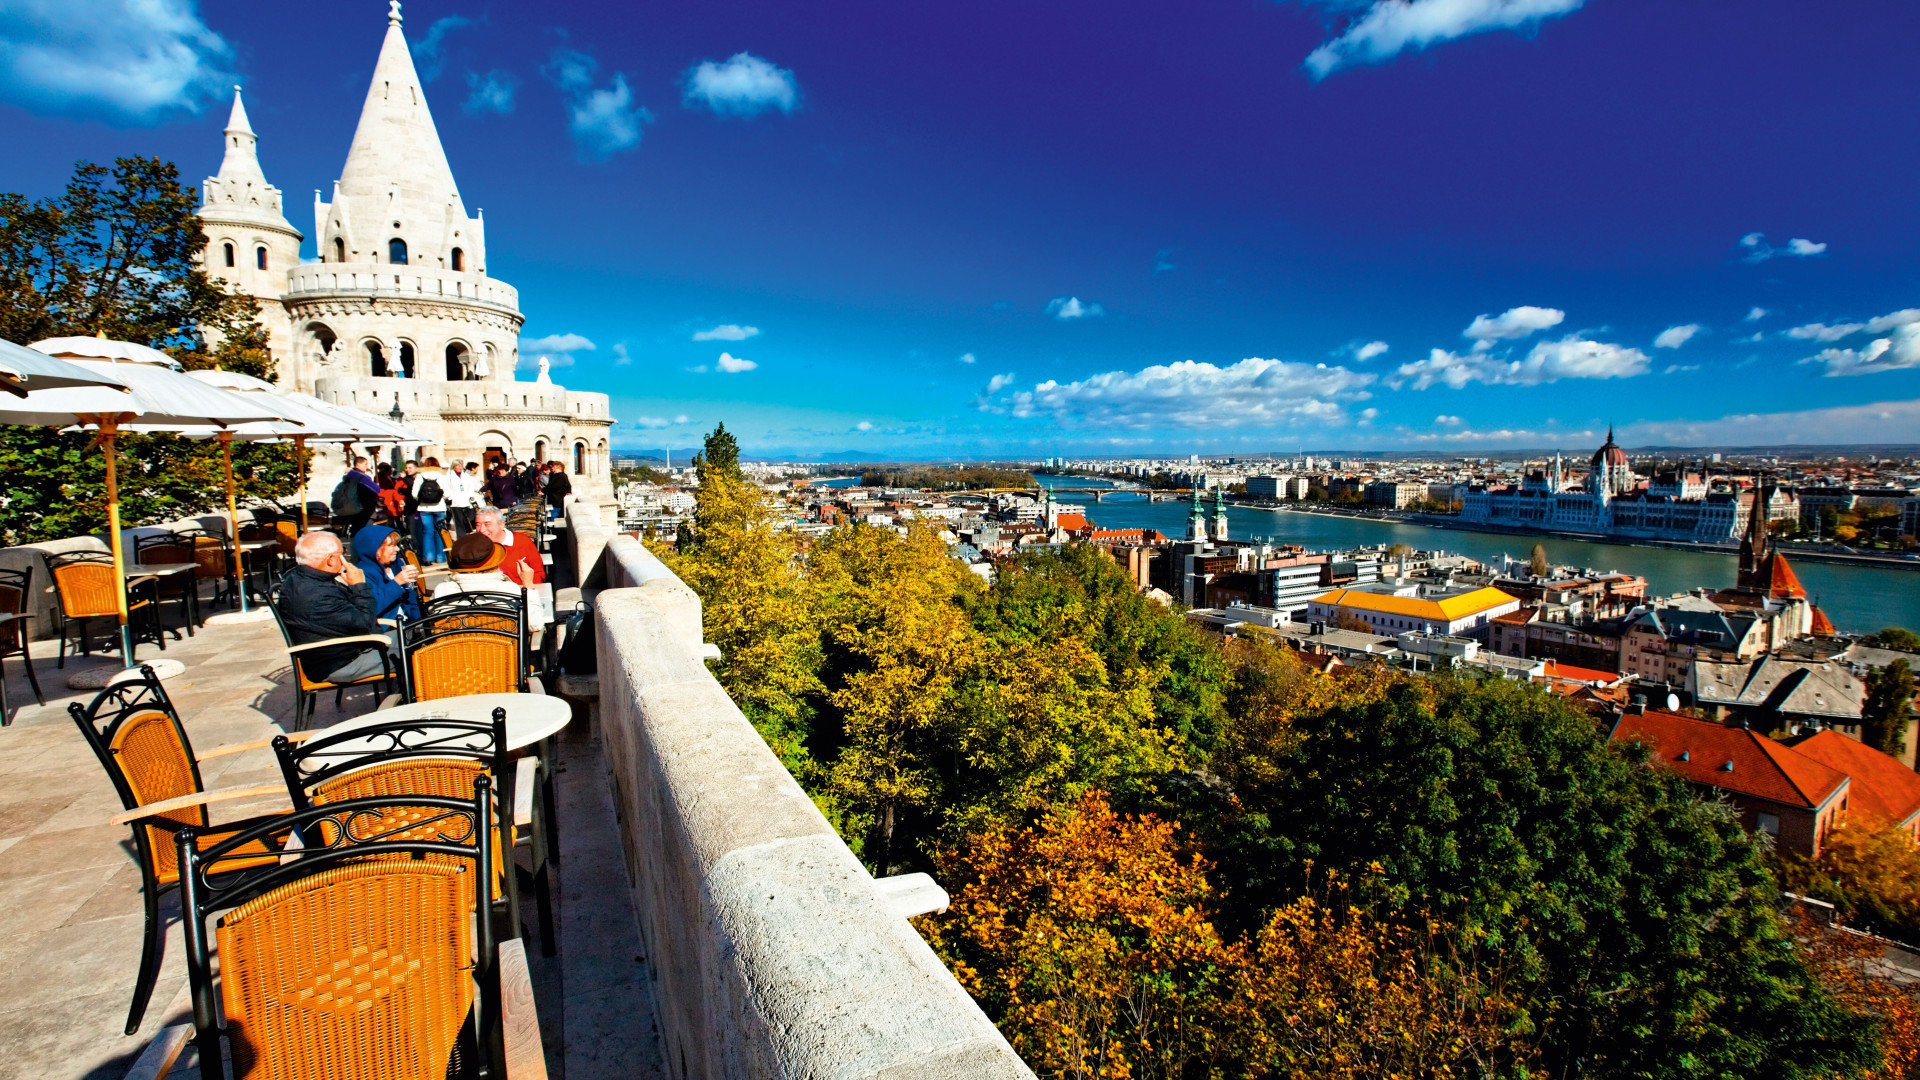 Terrace bar overlooking the Danube